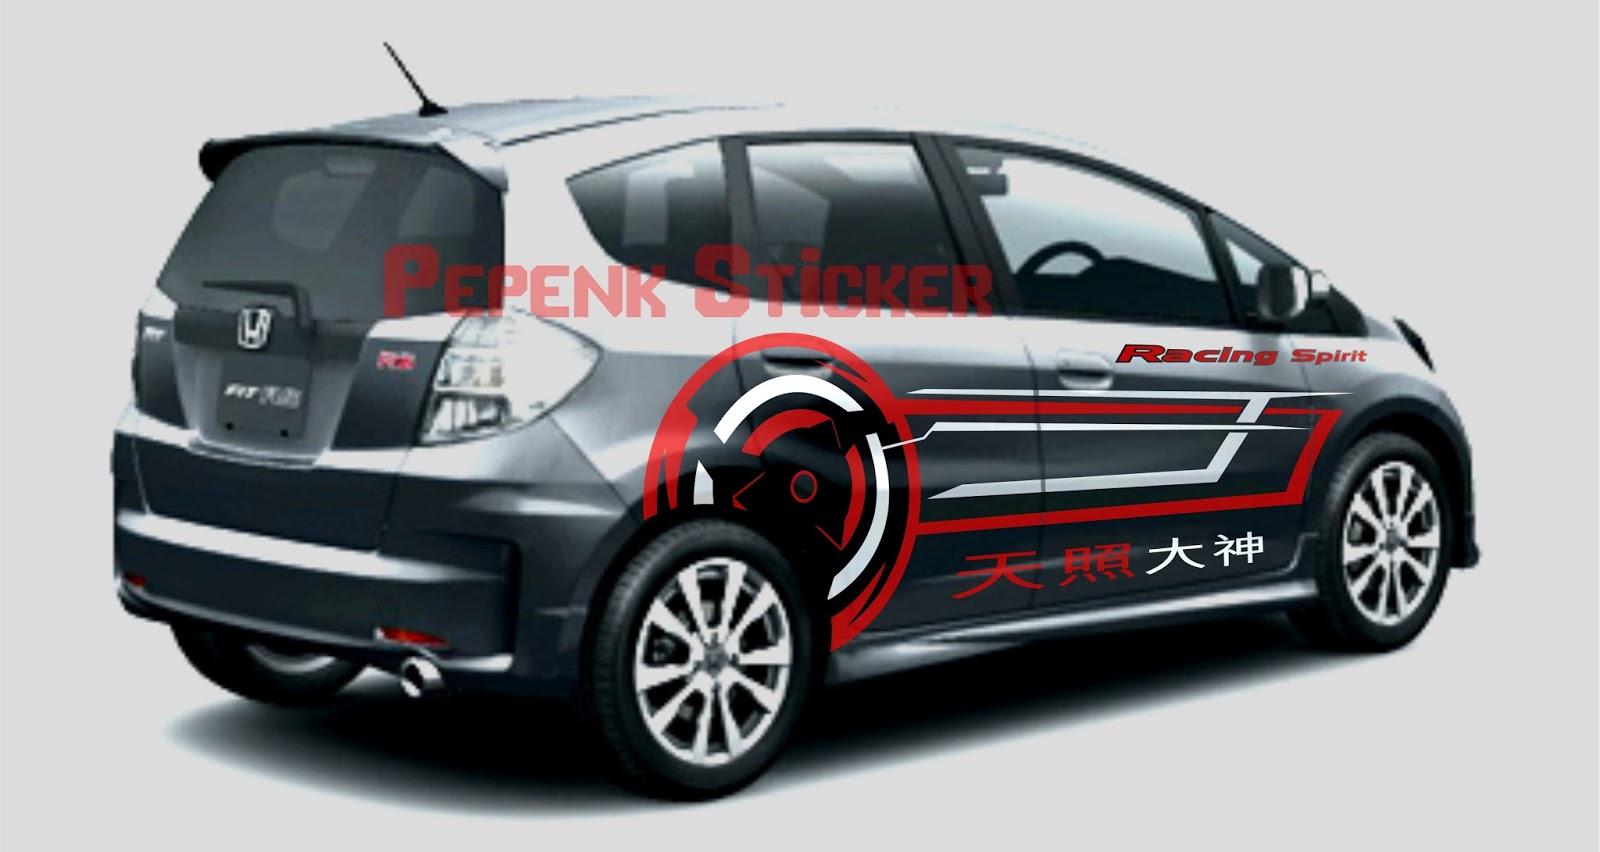 Gambar Cutting Sticker Mobil Pajero | Duniaotto